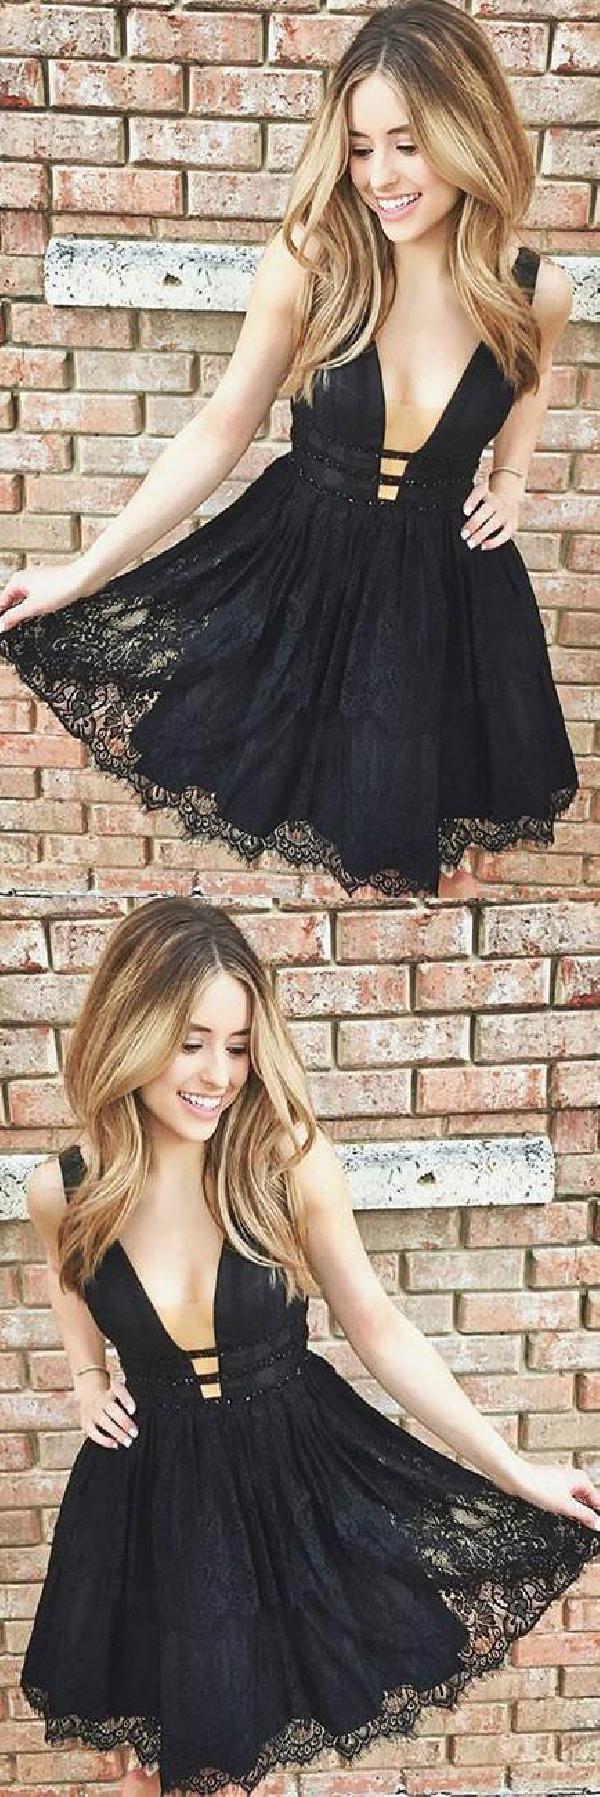 Homecoming dress lace homecomingdresslace homecoming dress black